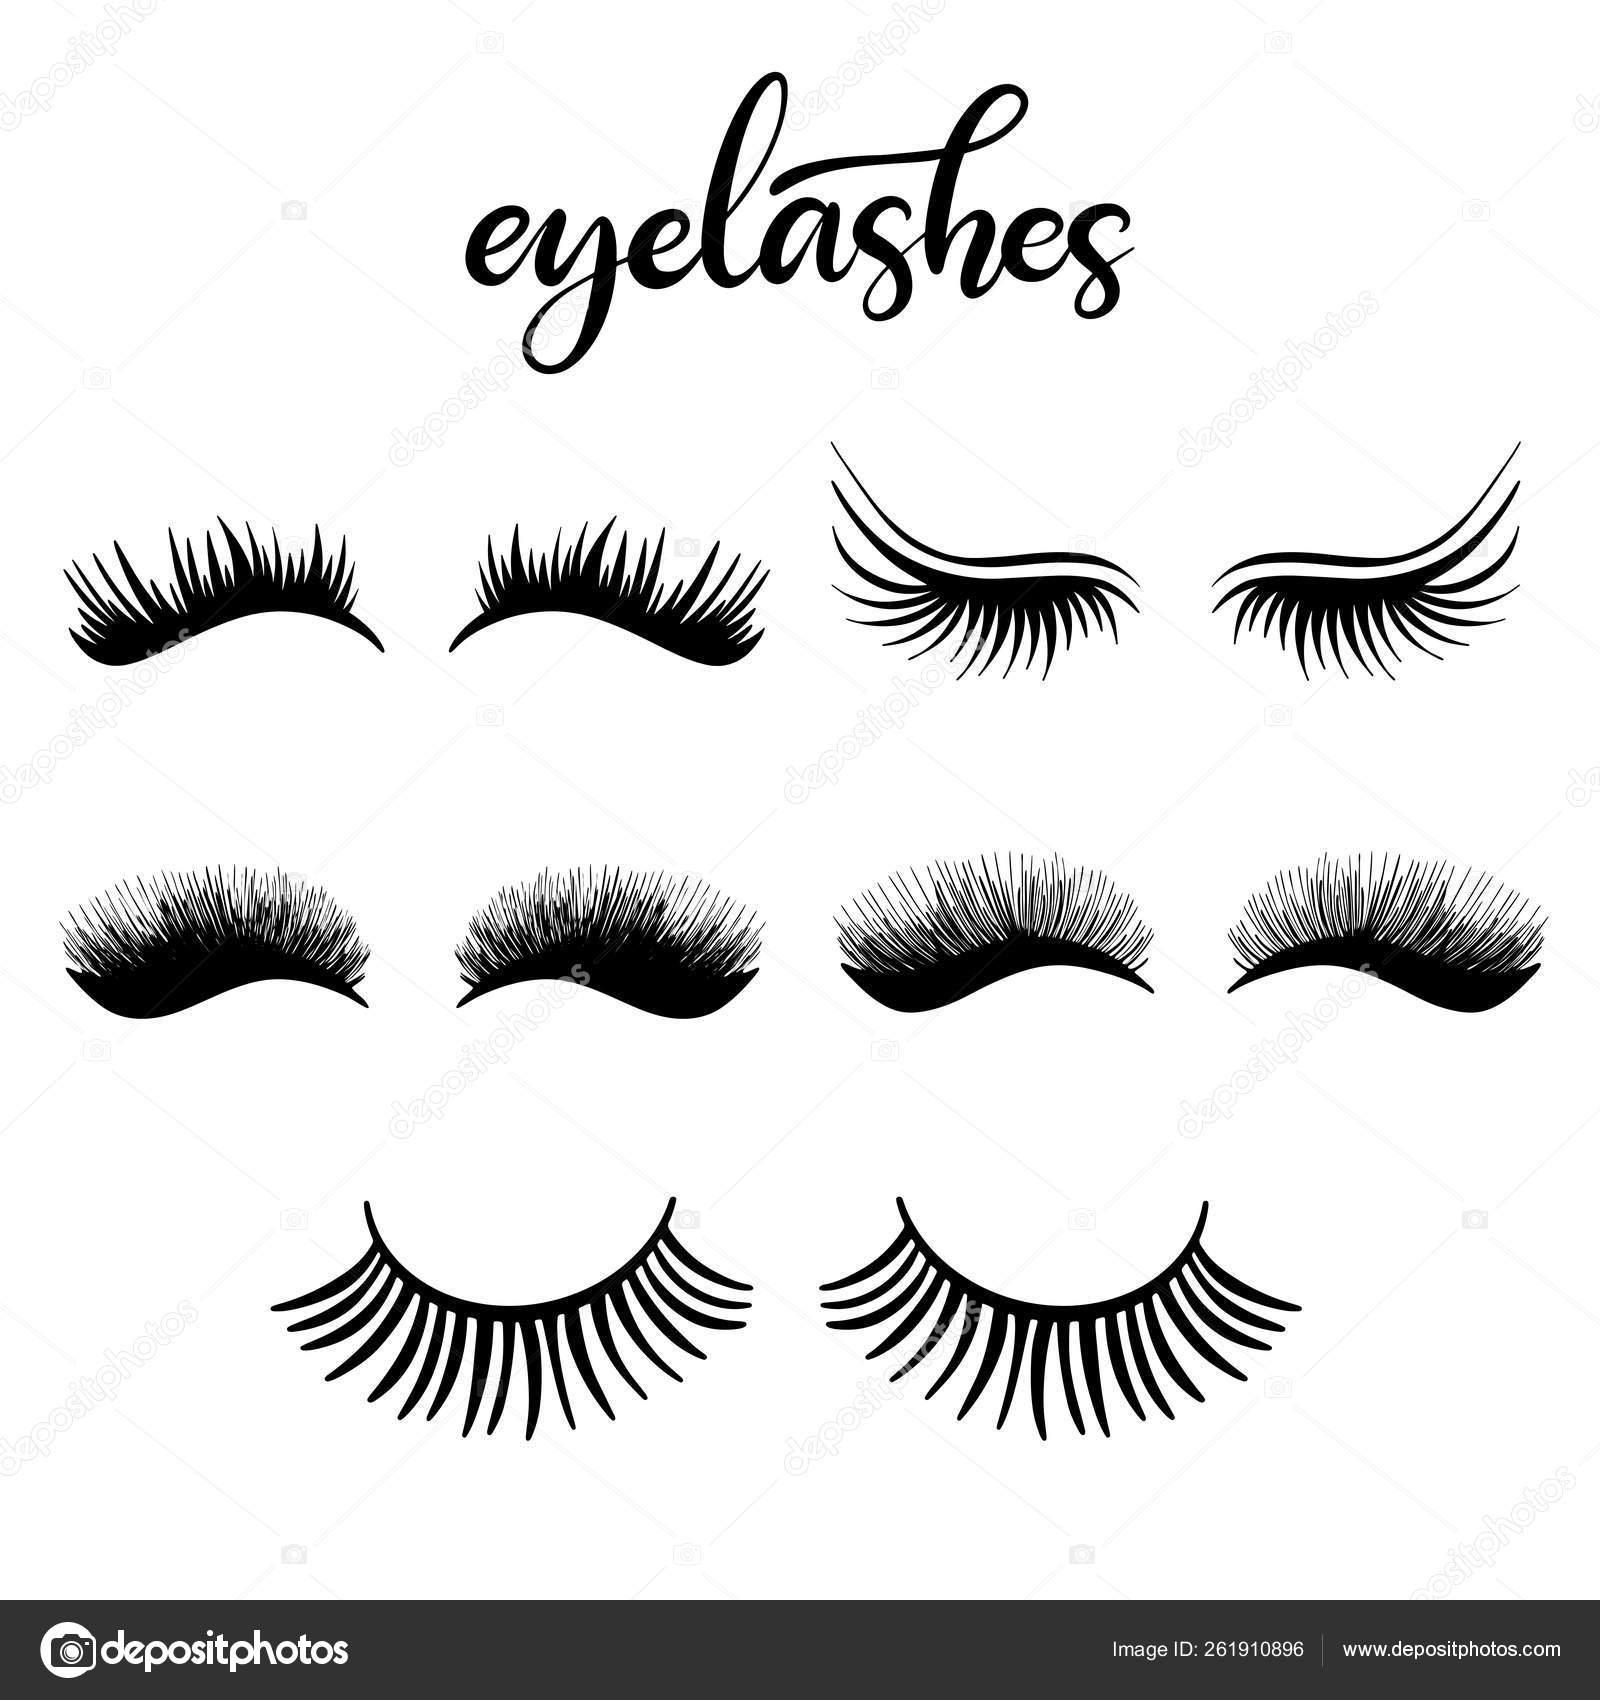 56a88333083 Lashes lettering vector illustration for beauty salon, fashion blog, logo,  false eyelashes extensions maker, brow master, professional makeup artist.